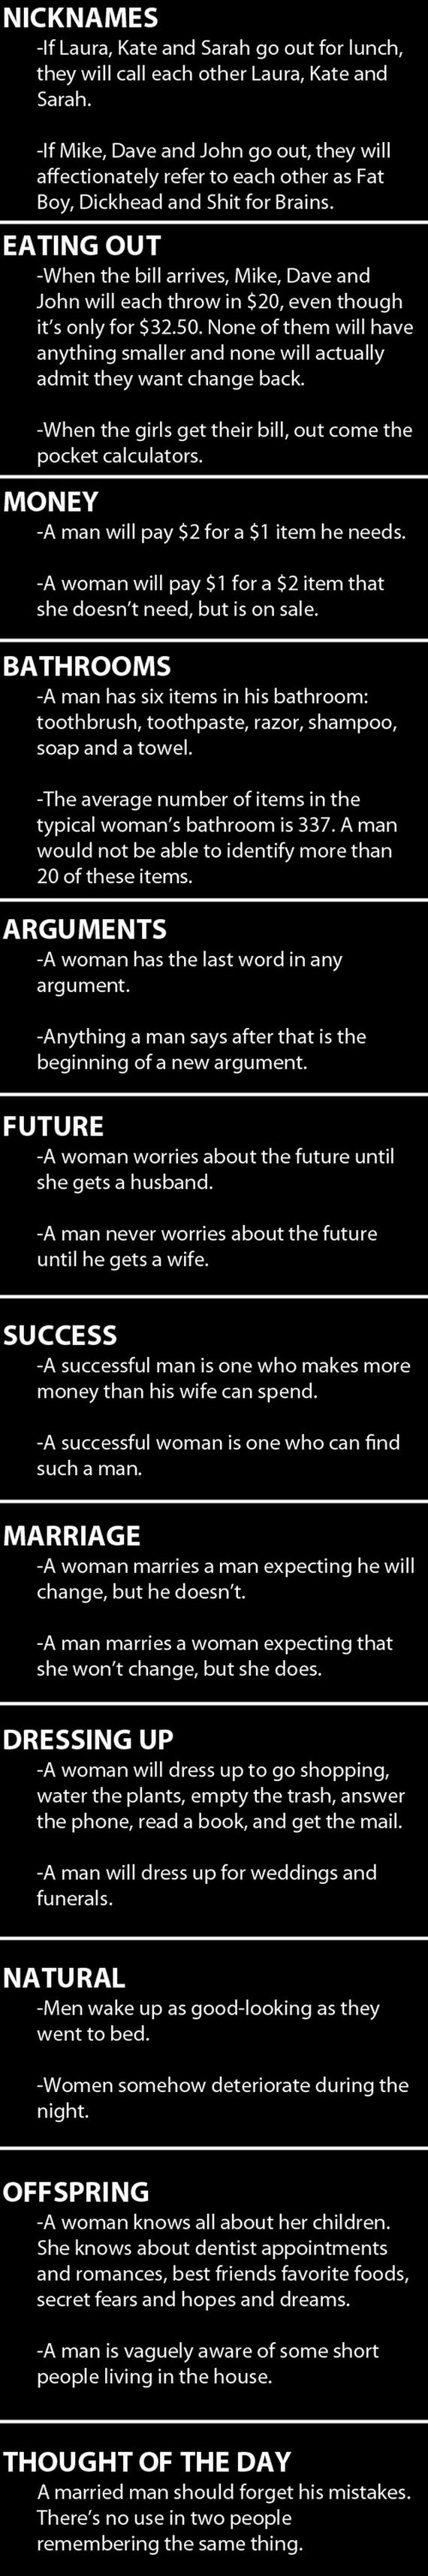 02 - Men Vs. Women Redux - Love Talk